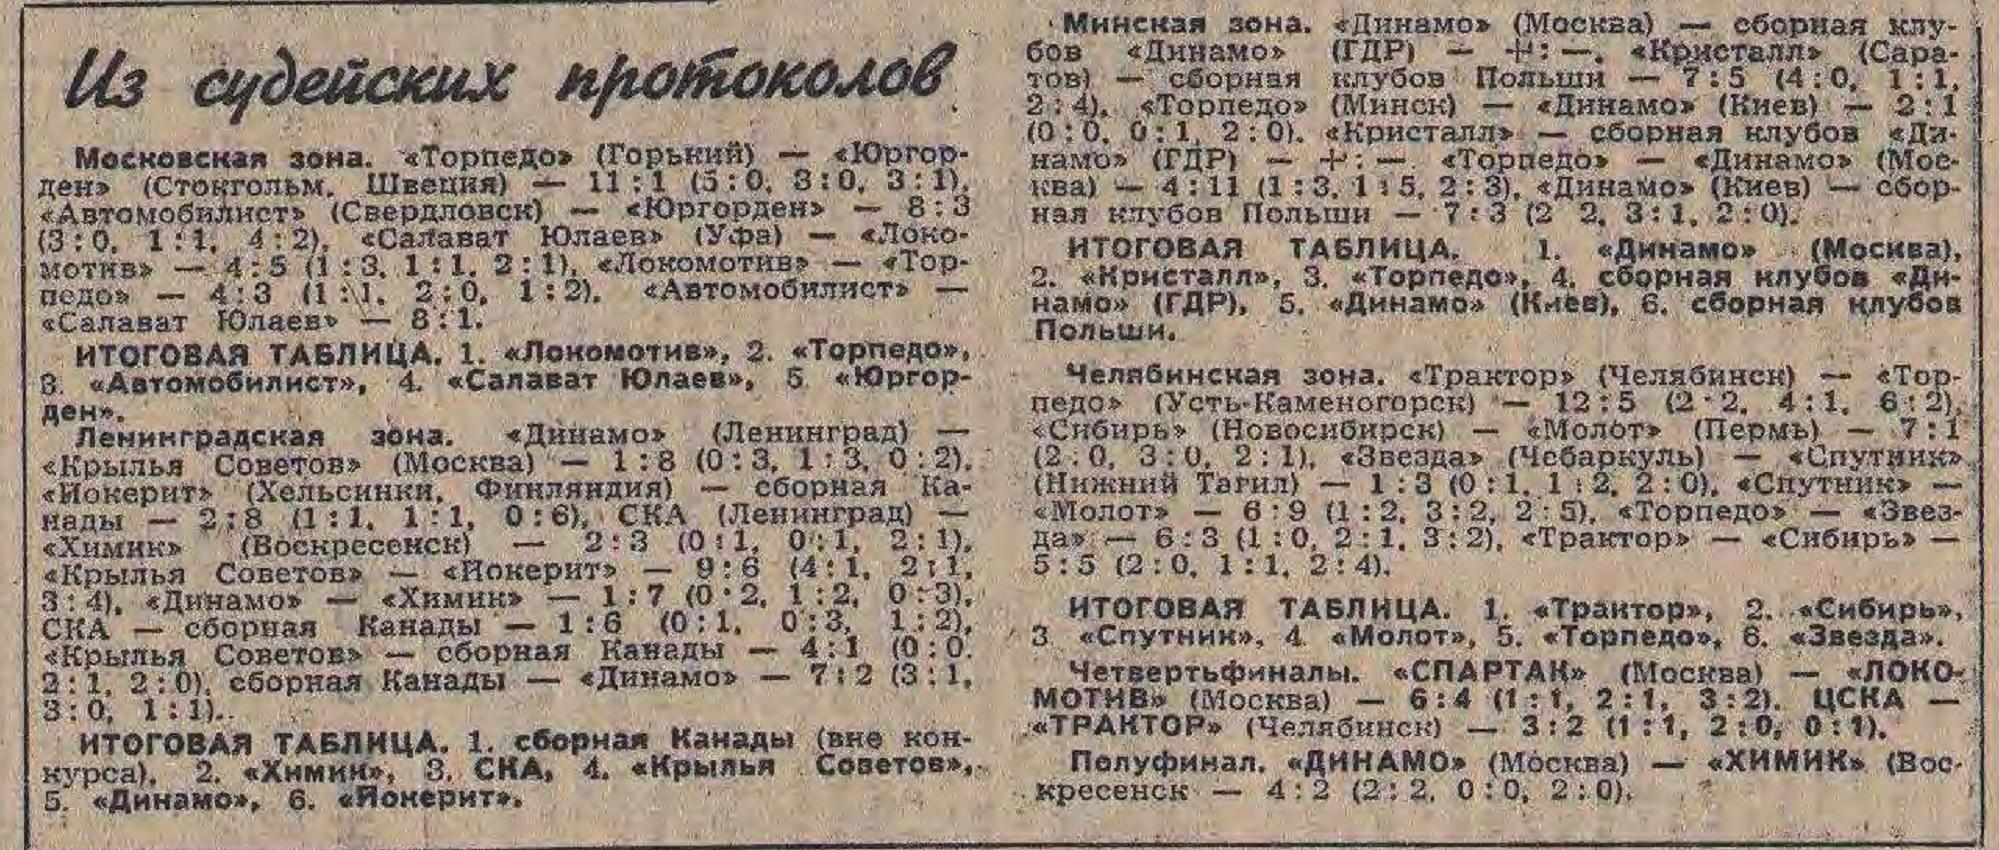 Футбол-Хоккей№36-7.09.69.jpg